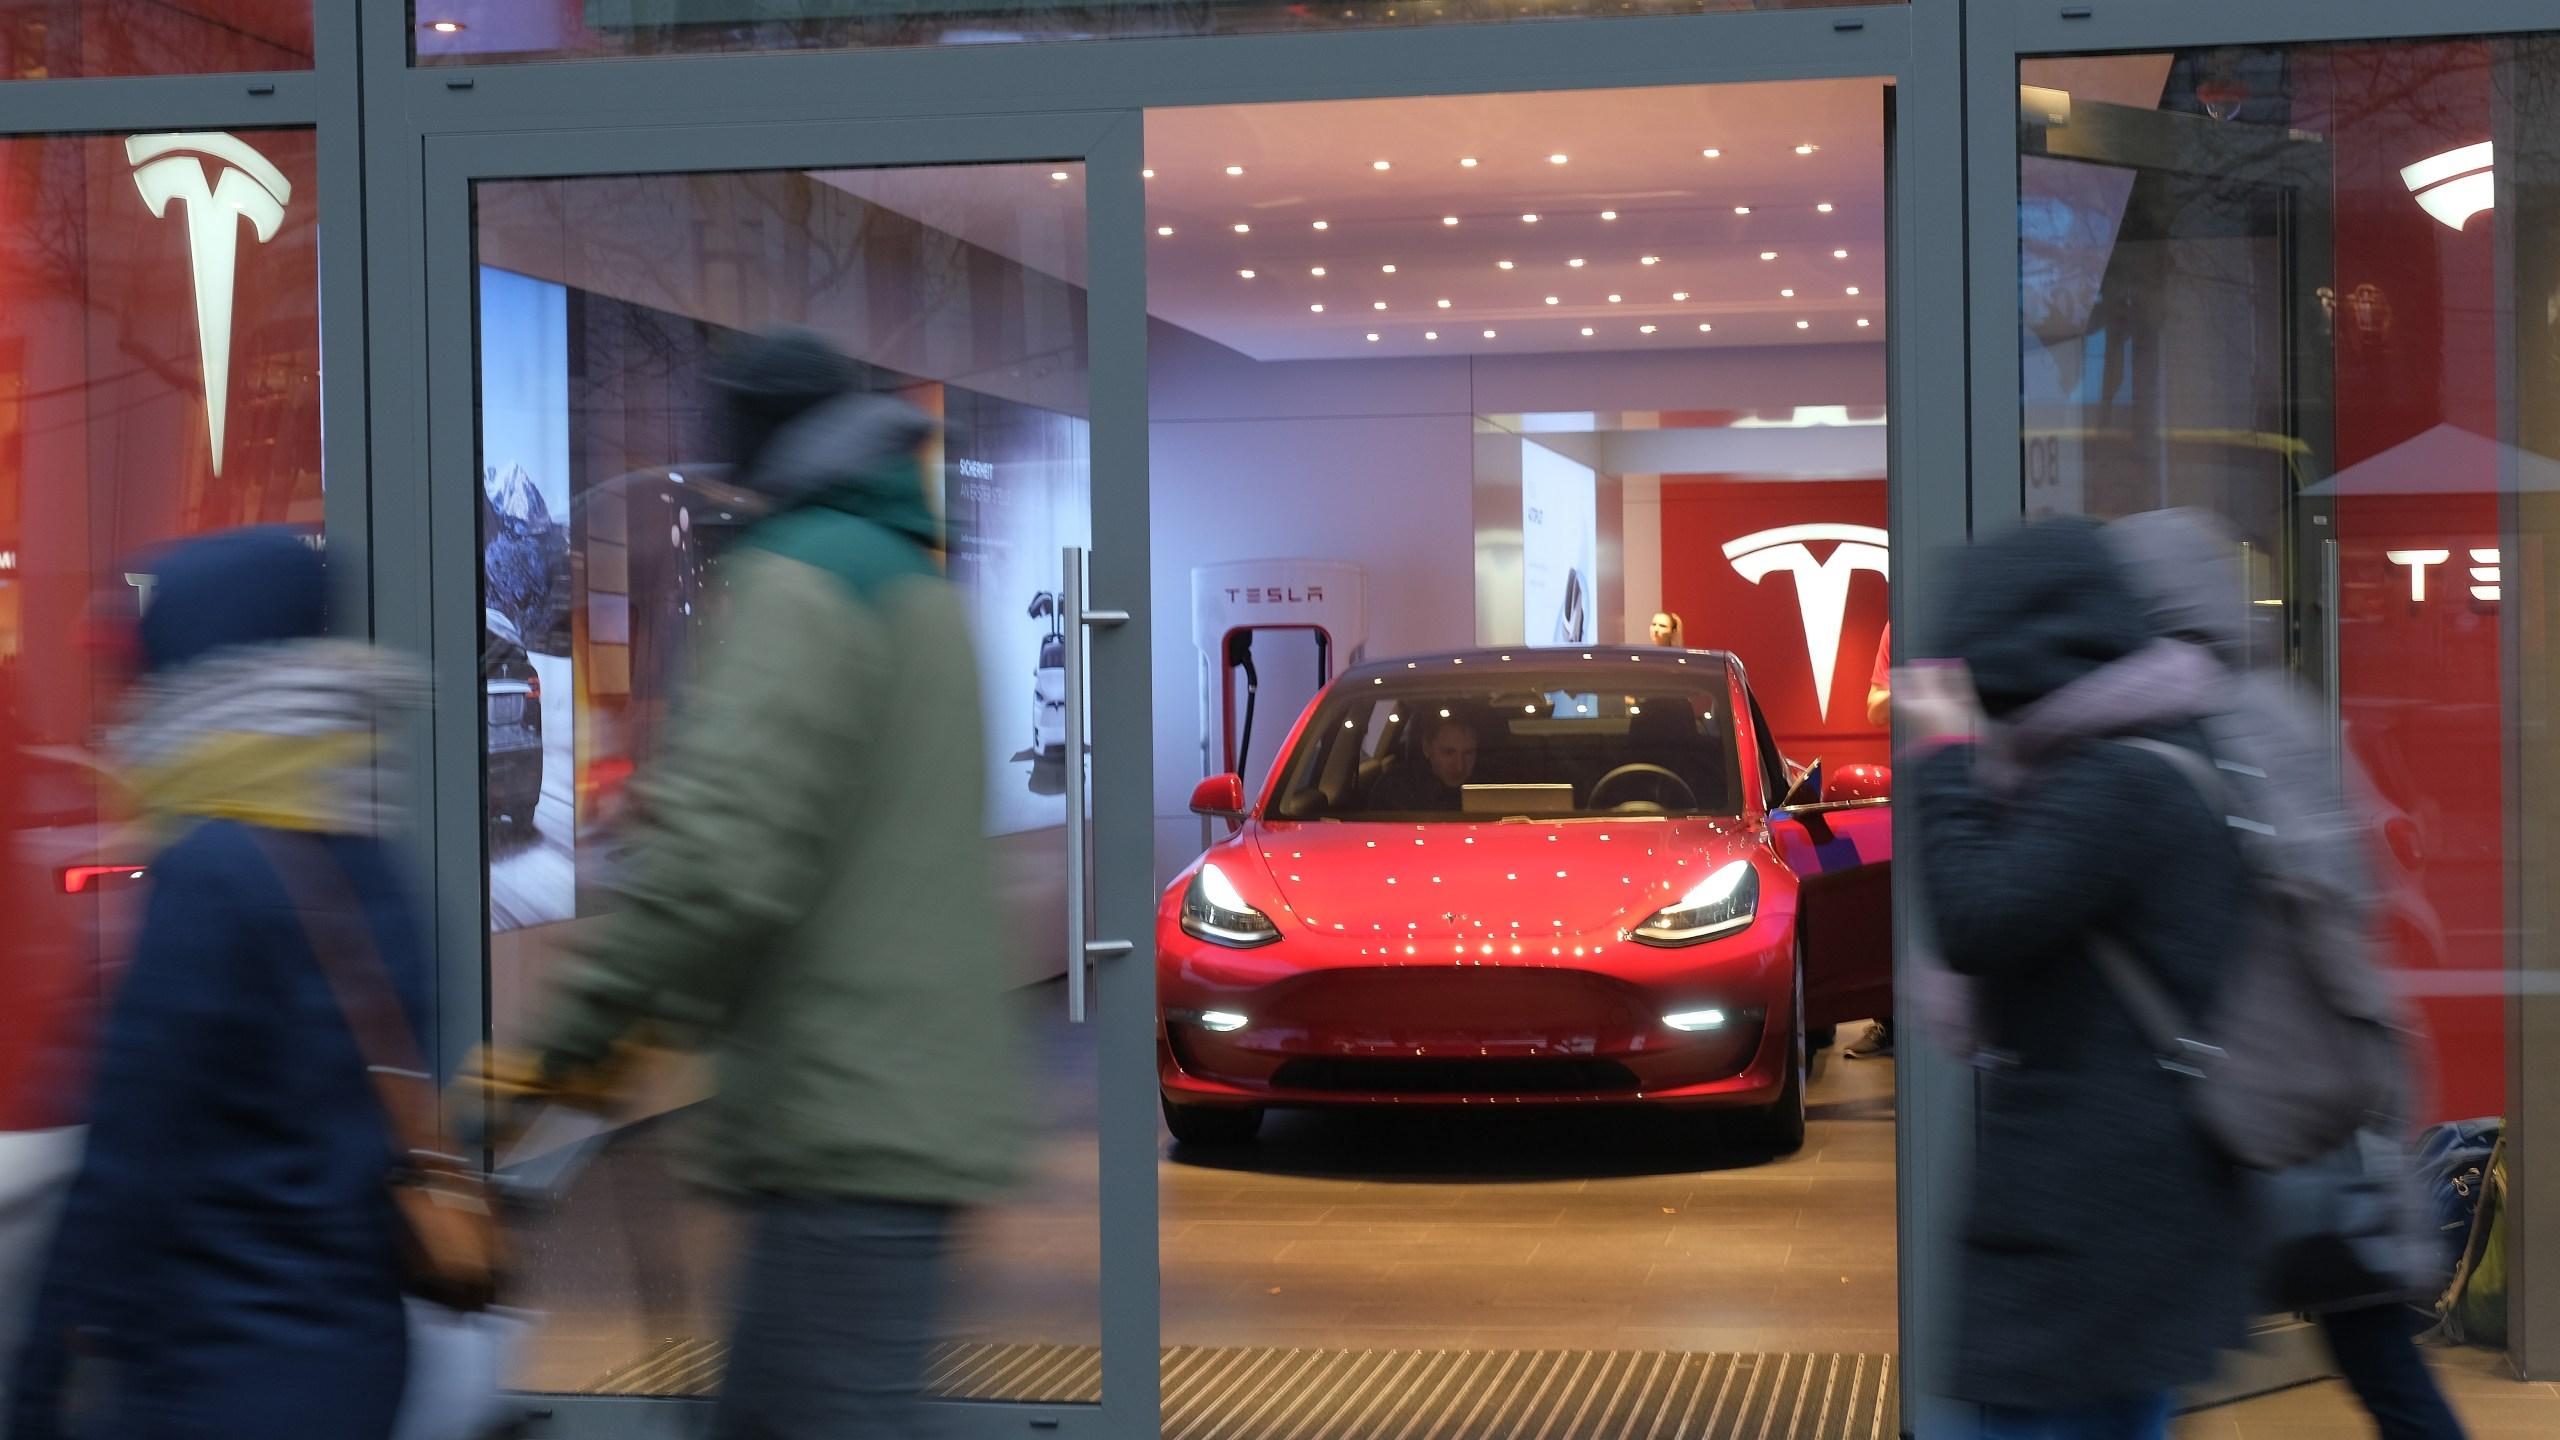 People walk past a Tesla dealership on in Berlin, Germany, on Jan. 4, 2019. (Credit: Sean Gallup / Getty Images)